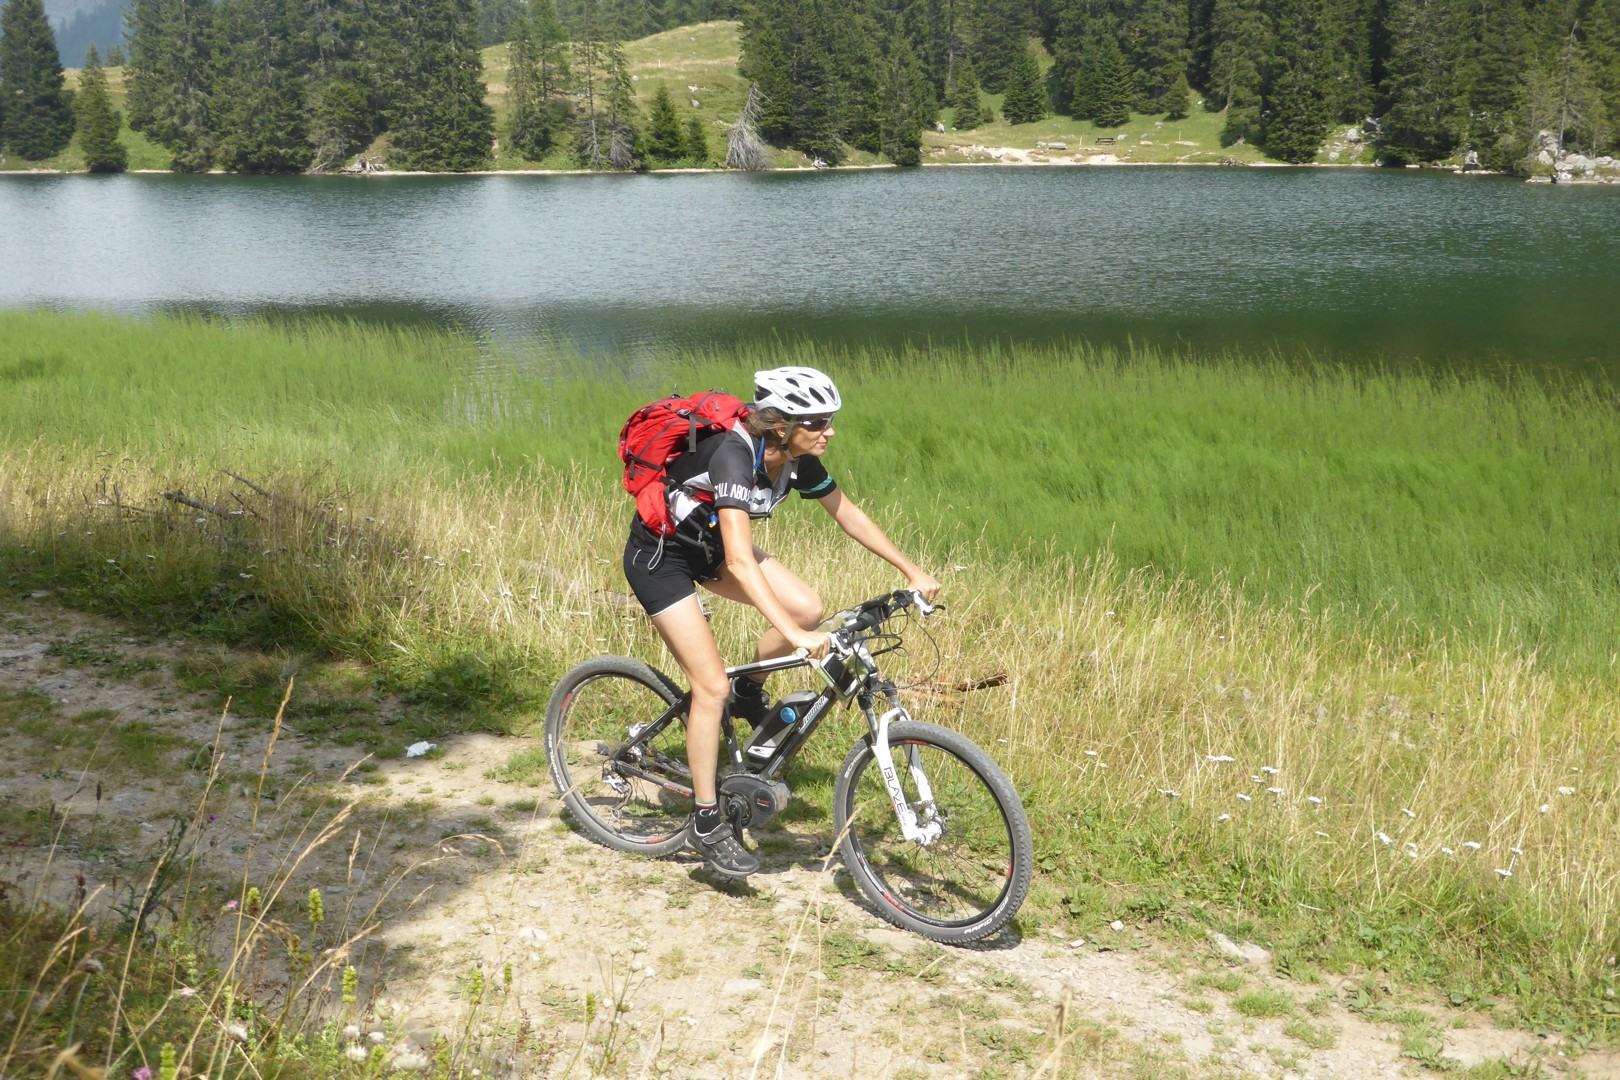 Dolomiti MTB - 1320.jpg - Italy - Dolomites of Brenta - Guided Mountain Bike Holiday - Mountain Biking